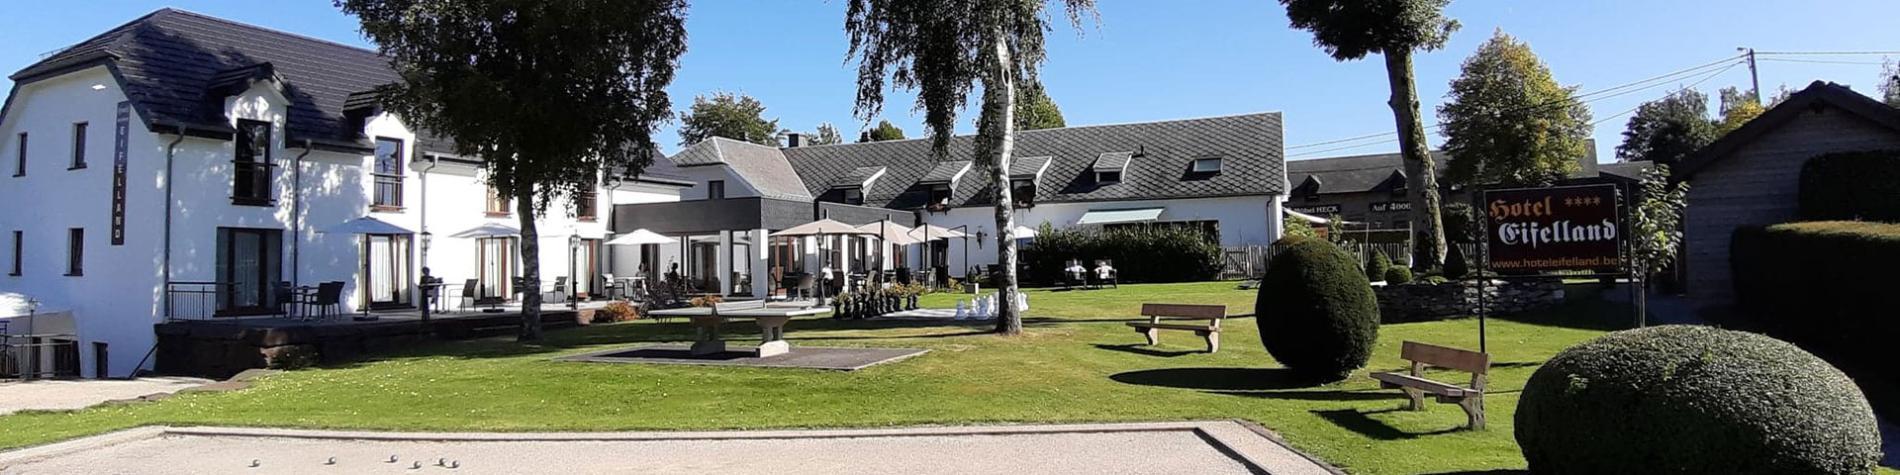 Hôtel - Eifelland - Butgenbach